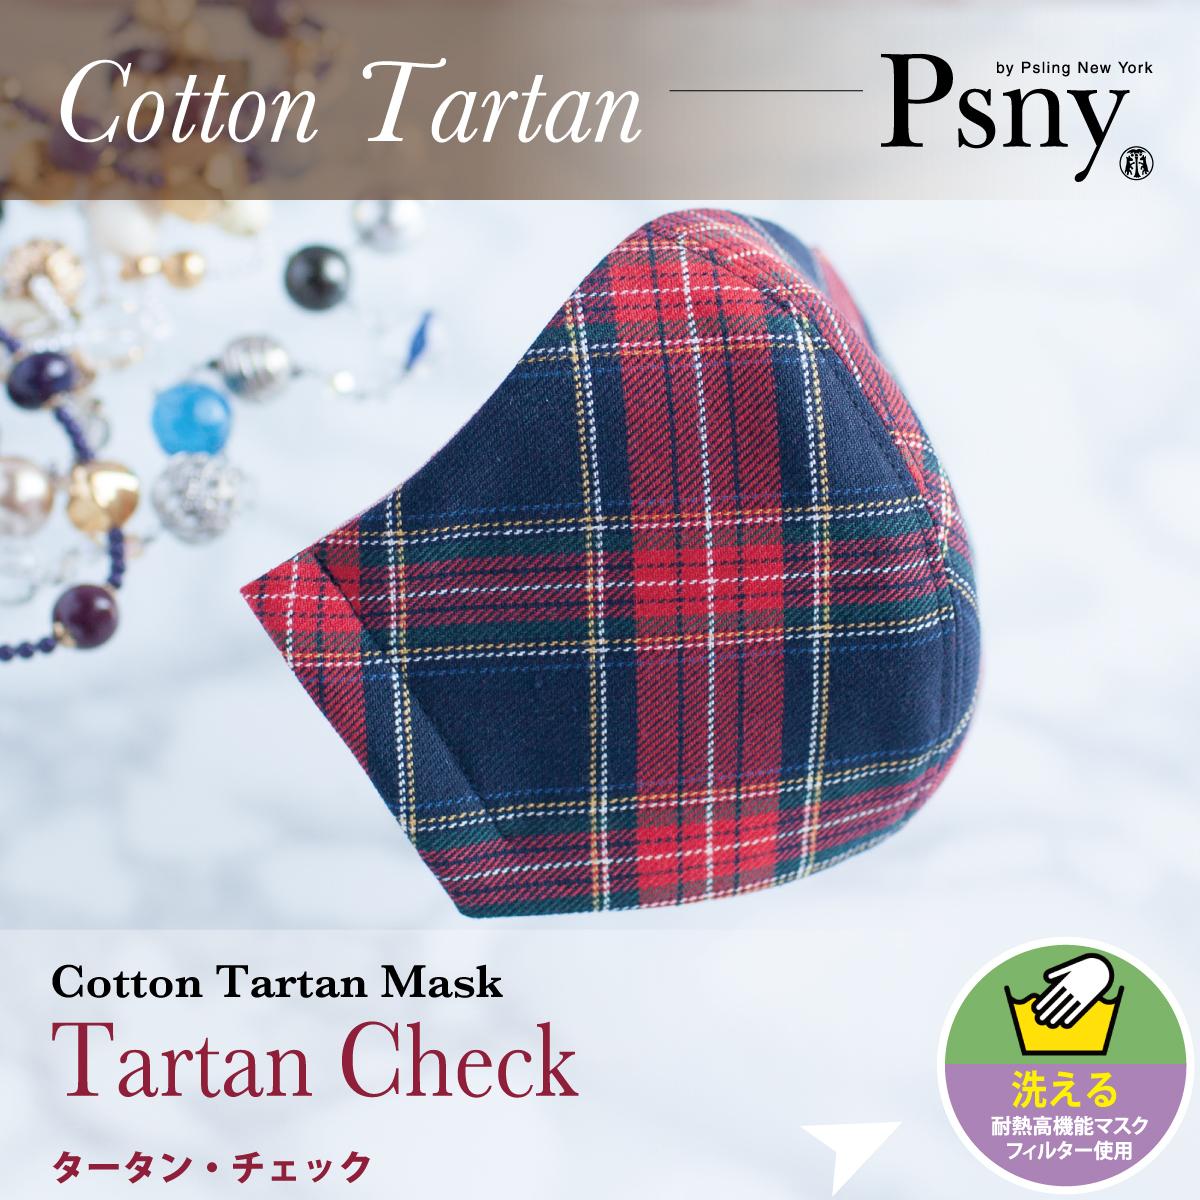 PSNY タータンチェック コットン 花粉 黄砂 洗える不織布フィルター 立体 大人用 マスク 送料無料 TC1